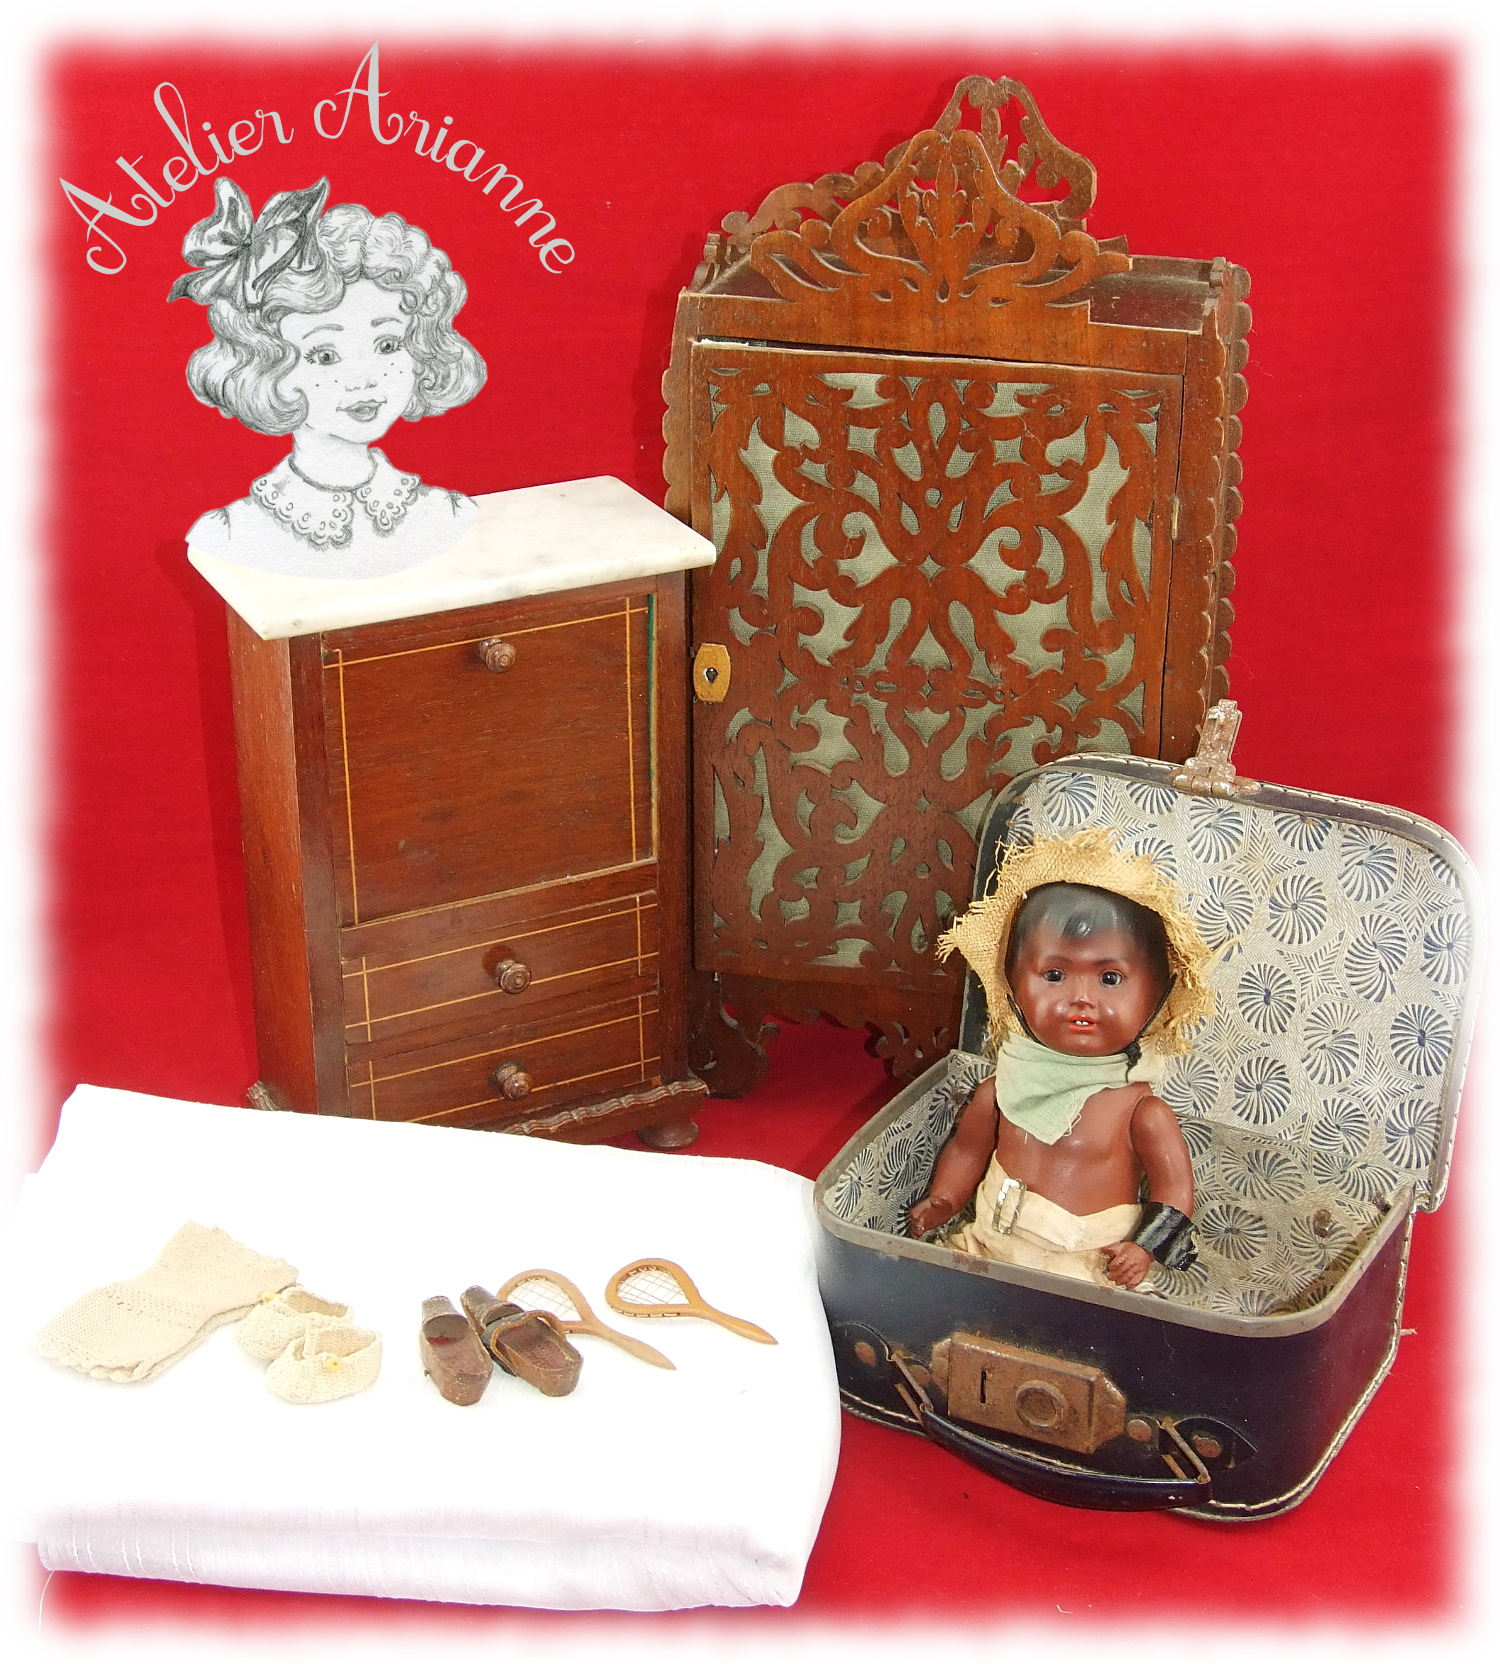 Splendides objets d'exposition offerts par Brigitte